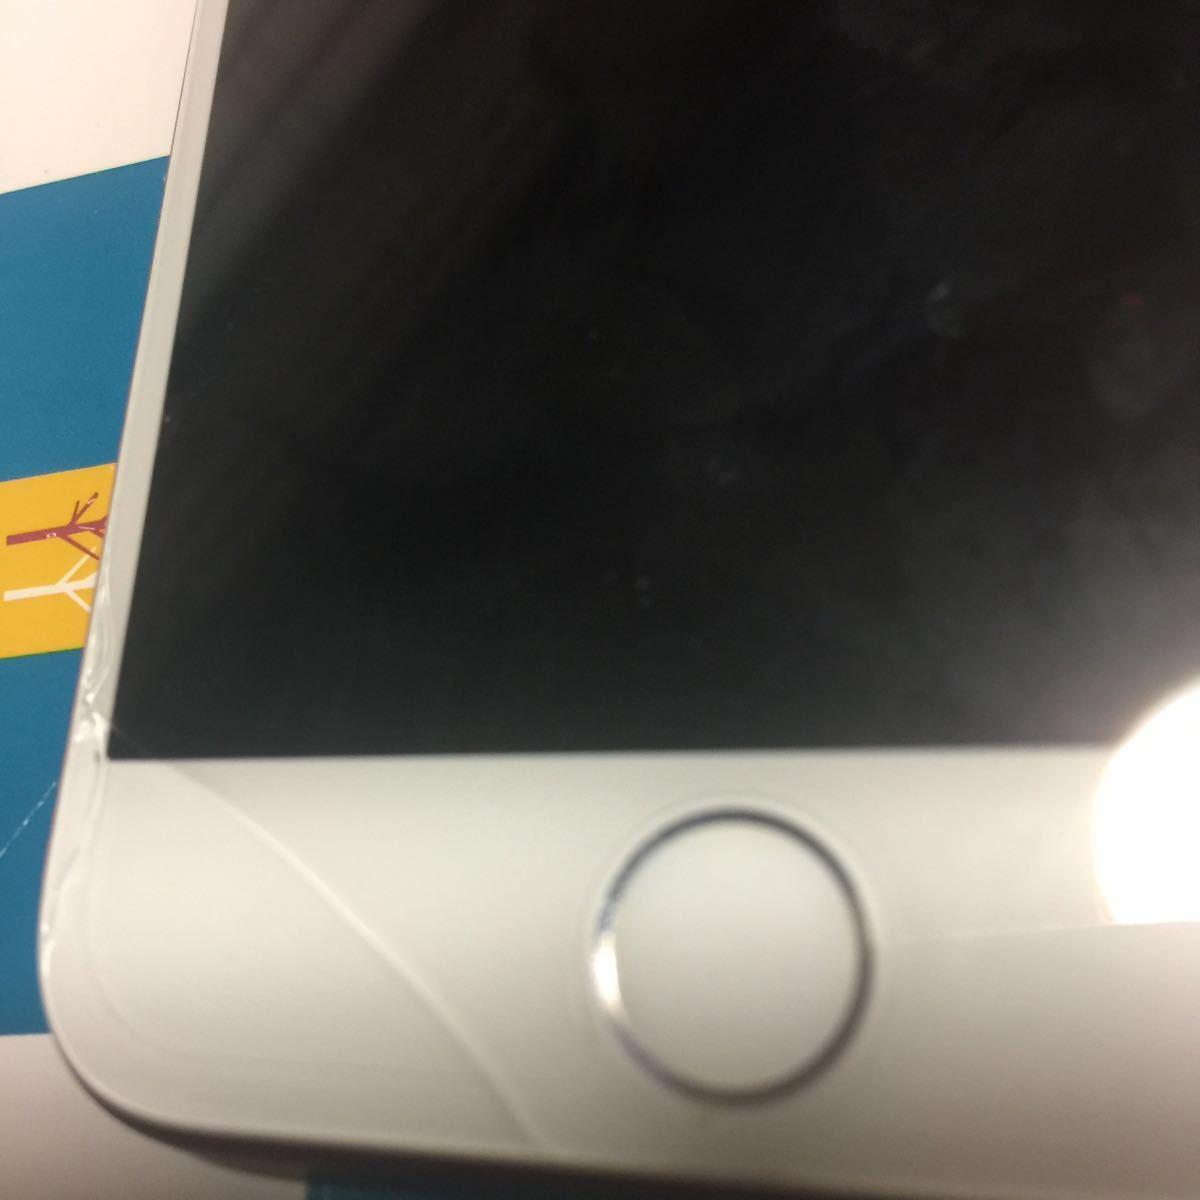 au iPhone 7 128GB (PRODUCT) レッド 本体 携帯 中古 スマホ apple アップル[ ジャンク] 送料無料。 全体 全体的に状態が悪い。_画像4